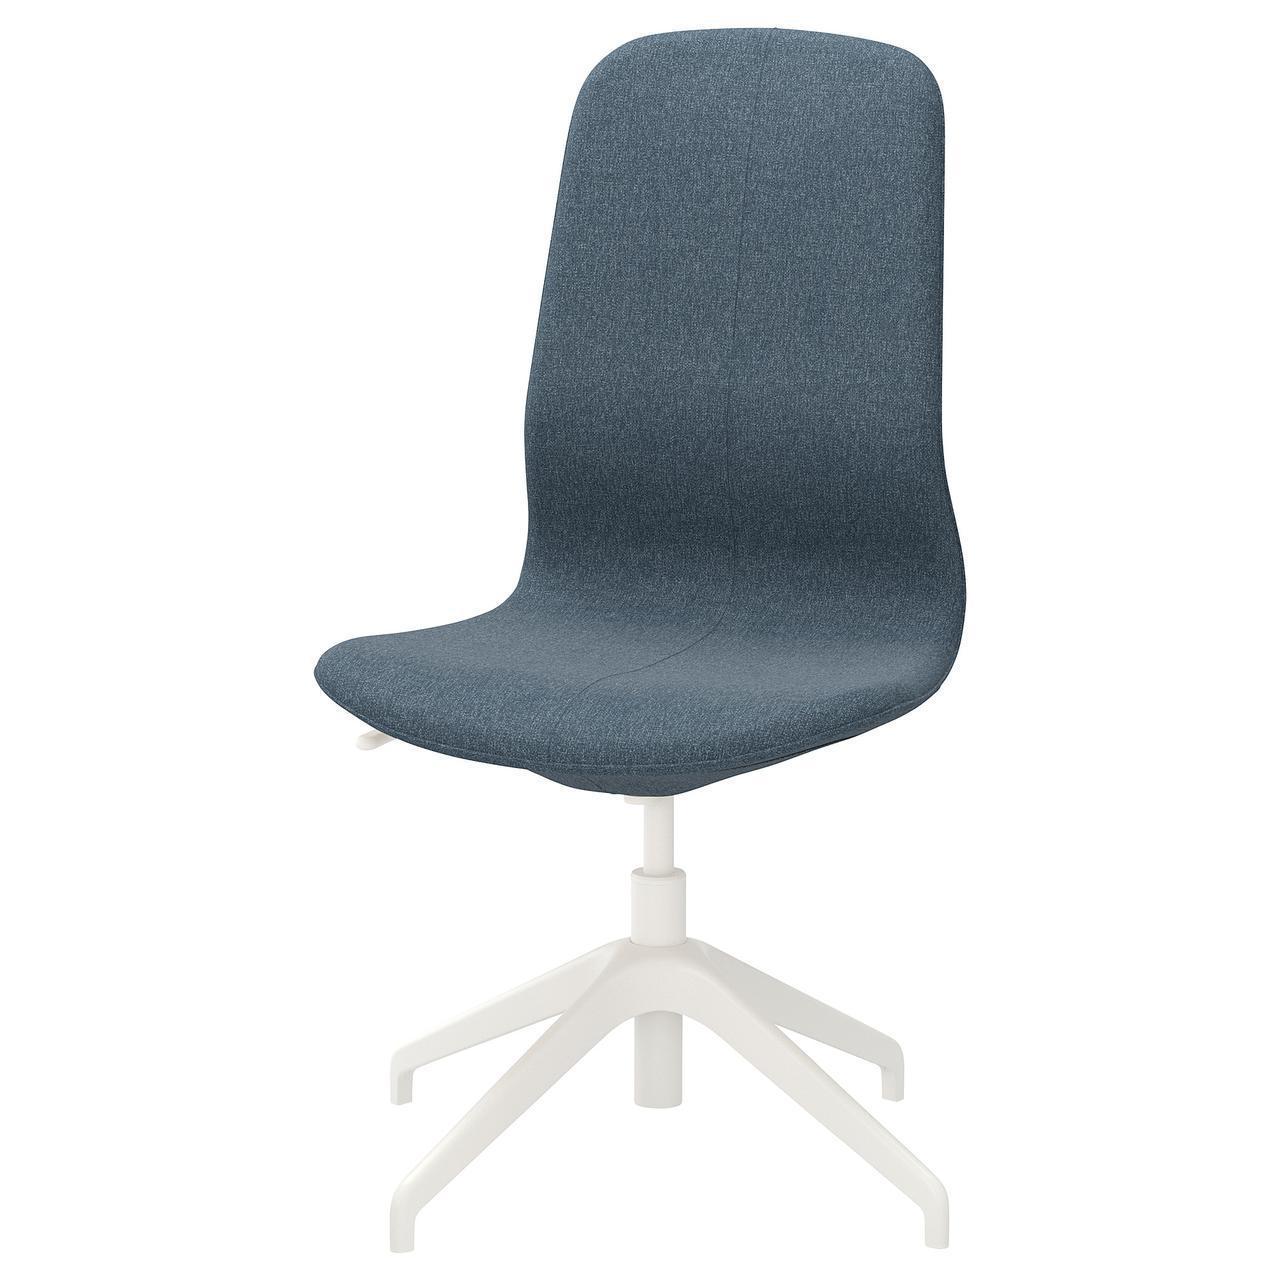 Комп'ютерне крісло IKEA LÅNGFJÄLL Gunnared блакитне біле 192.523.47